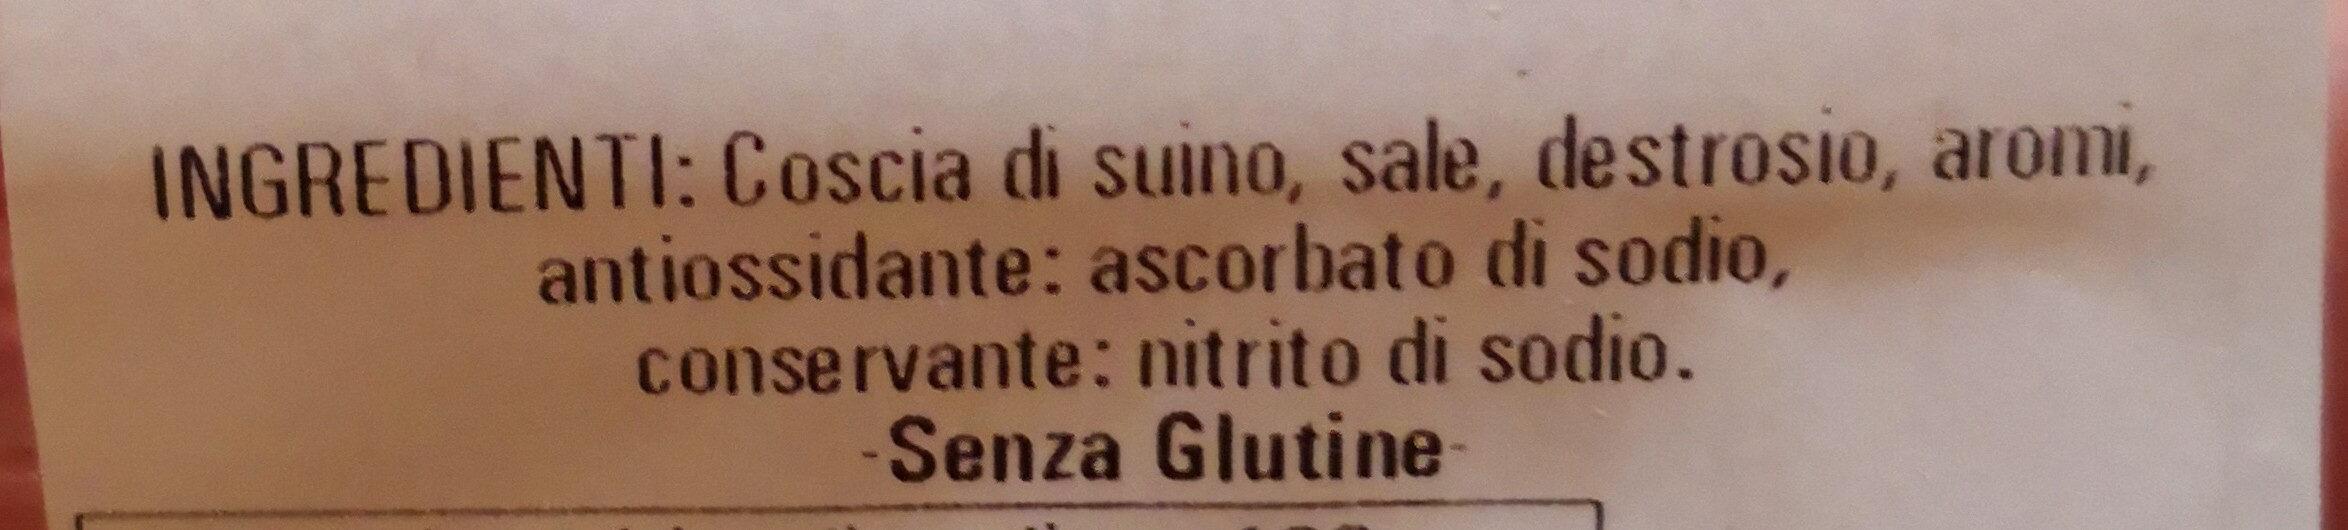 prosciutto cotto - Ingredients